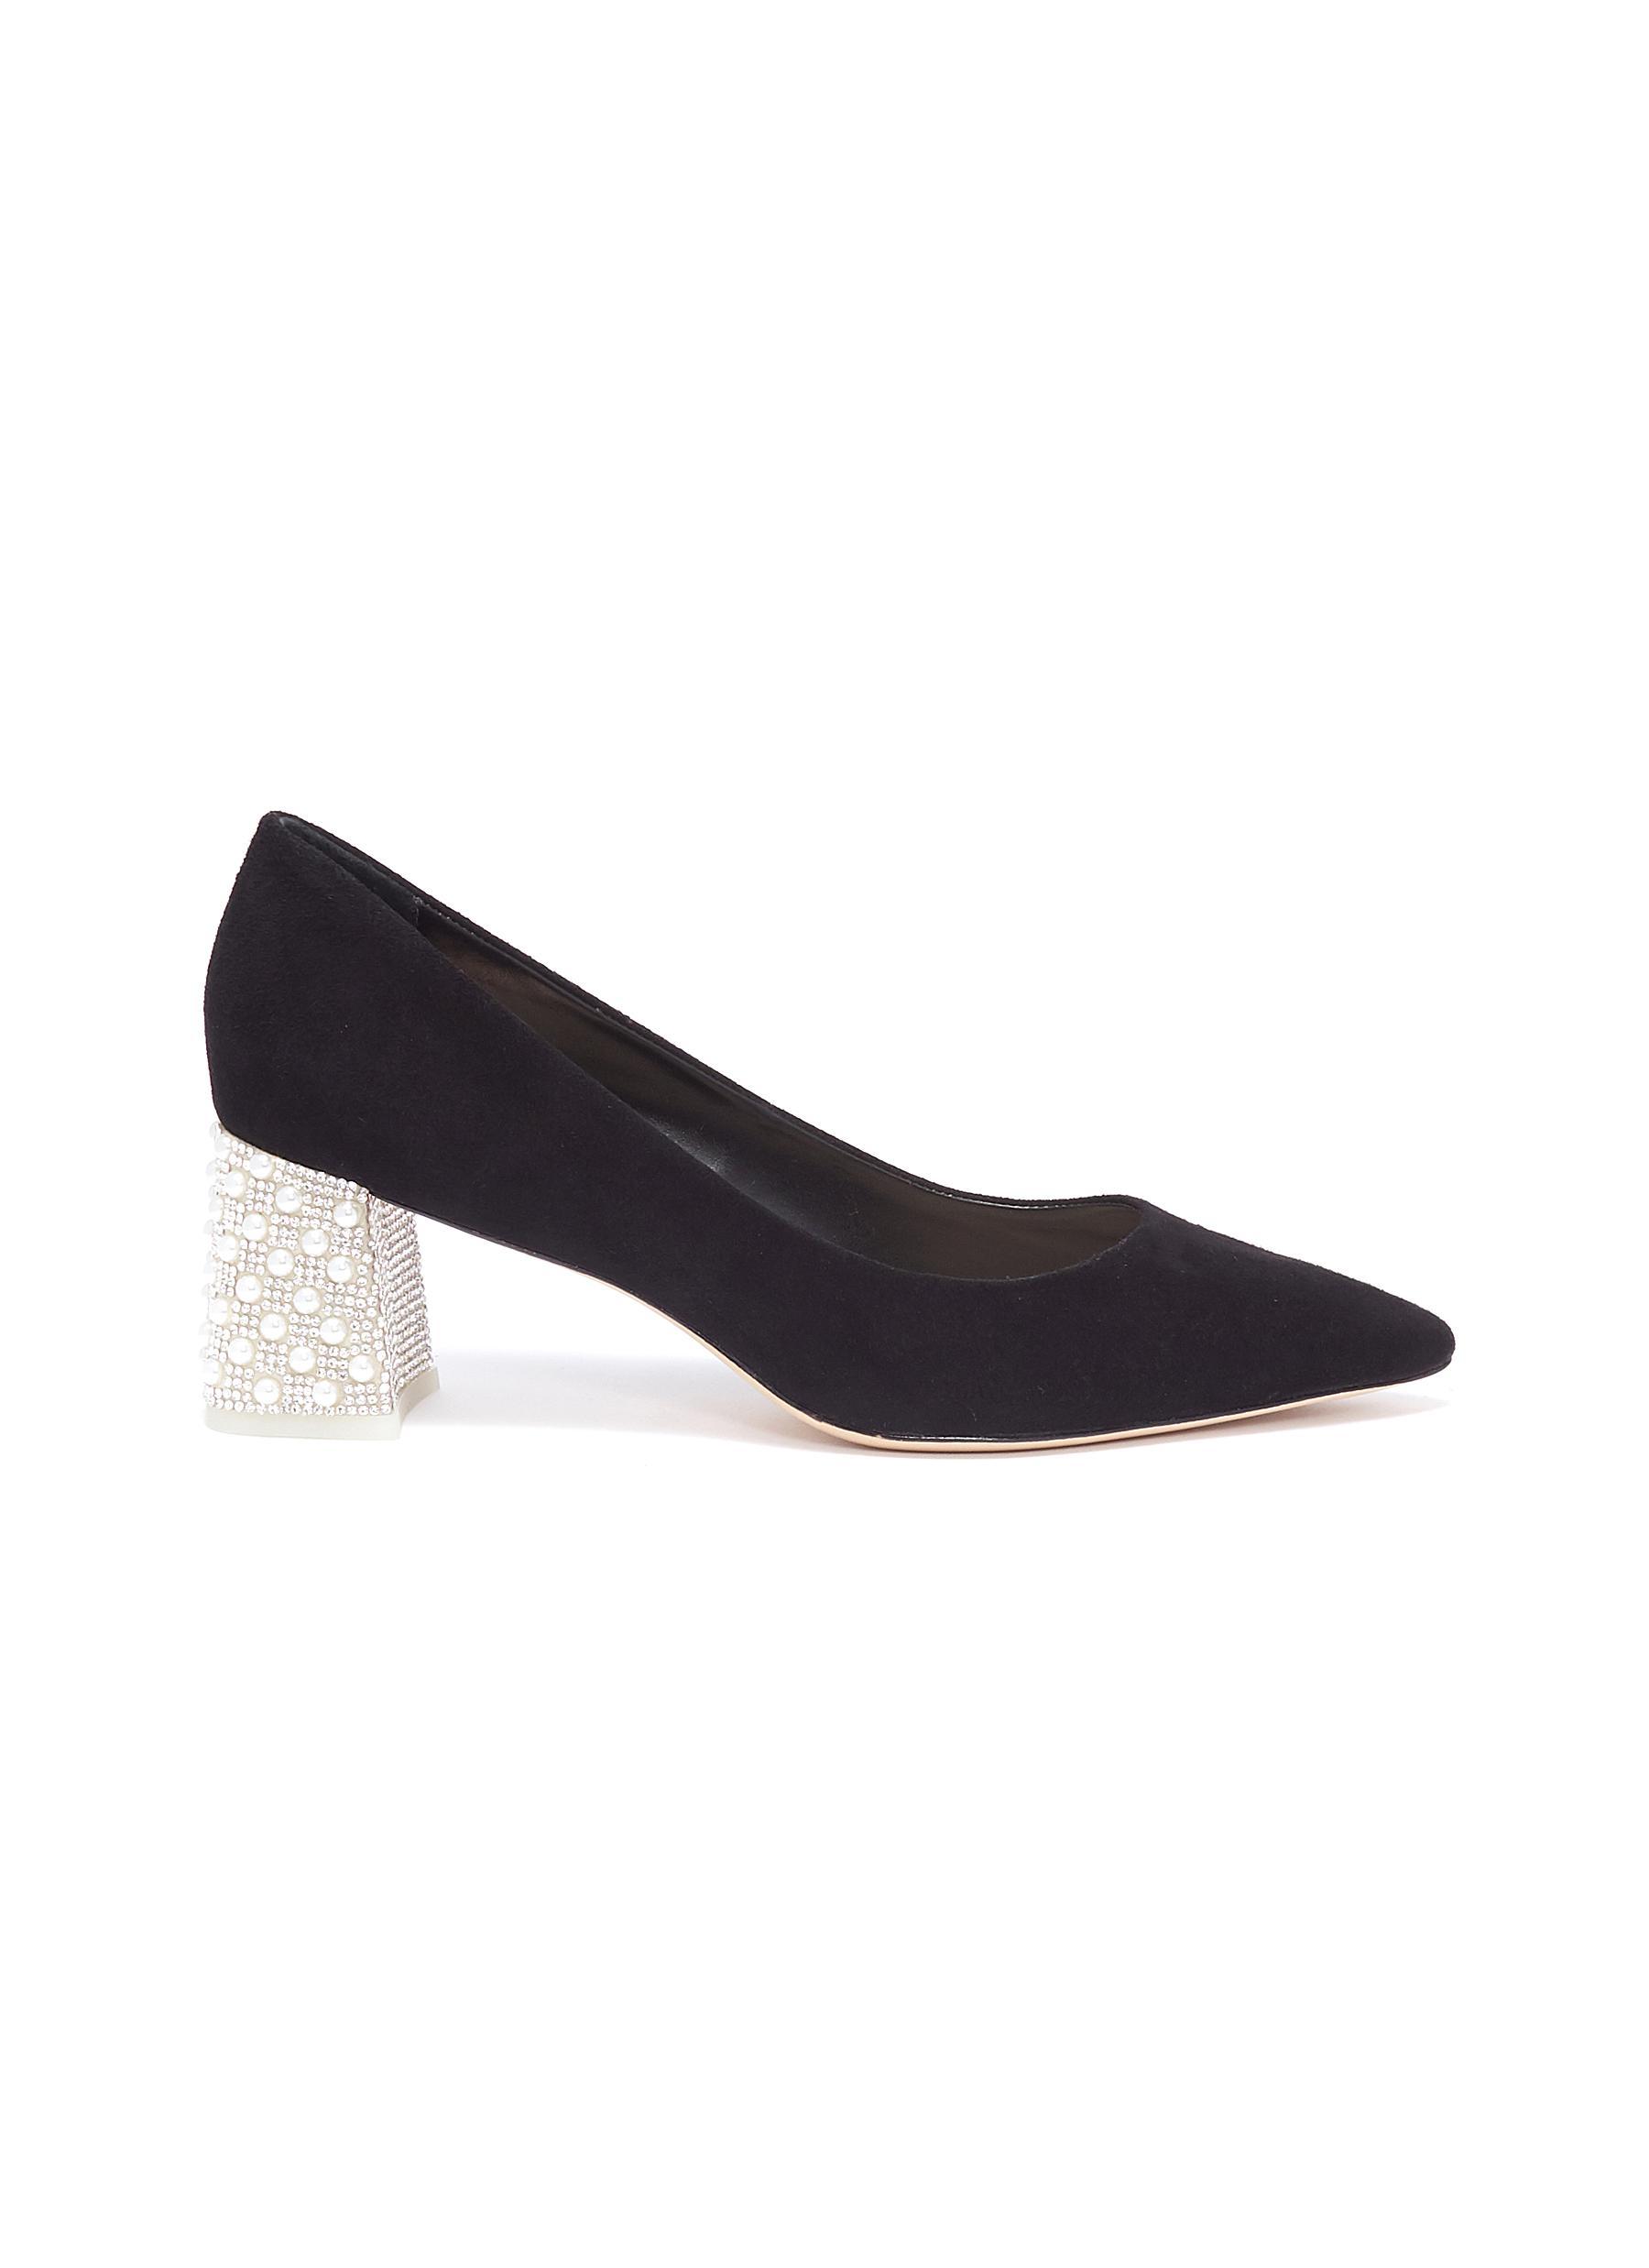 Sophia Webster Mid Heels Amber embellished heel suede pumps